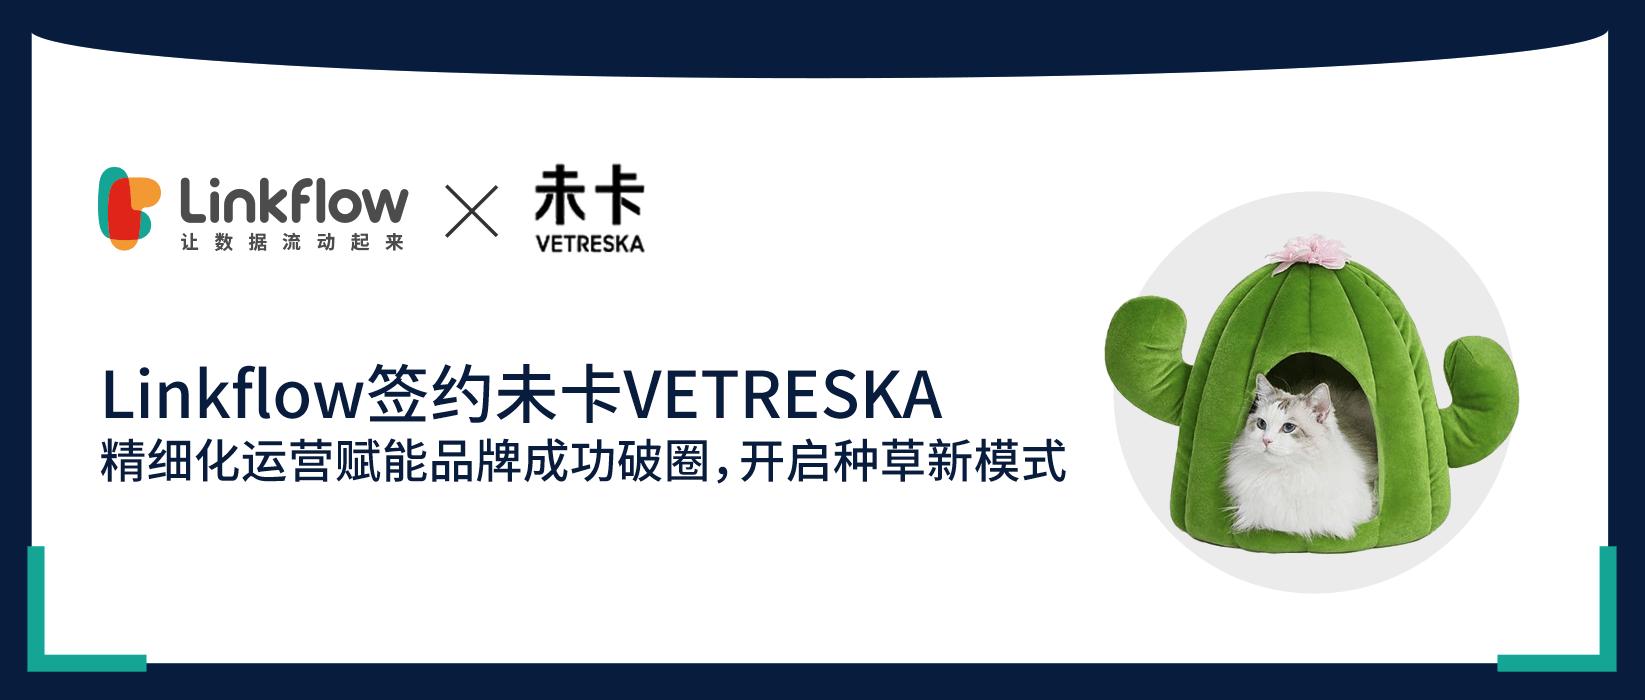 Linkflow签约未卡VETRESKA,精细化运营赋能品牌成功破圈,开启种草新模式